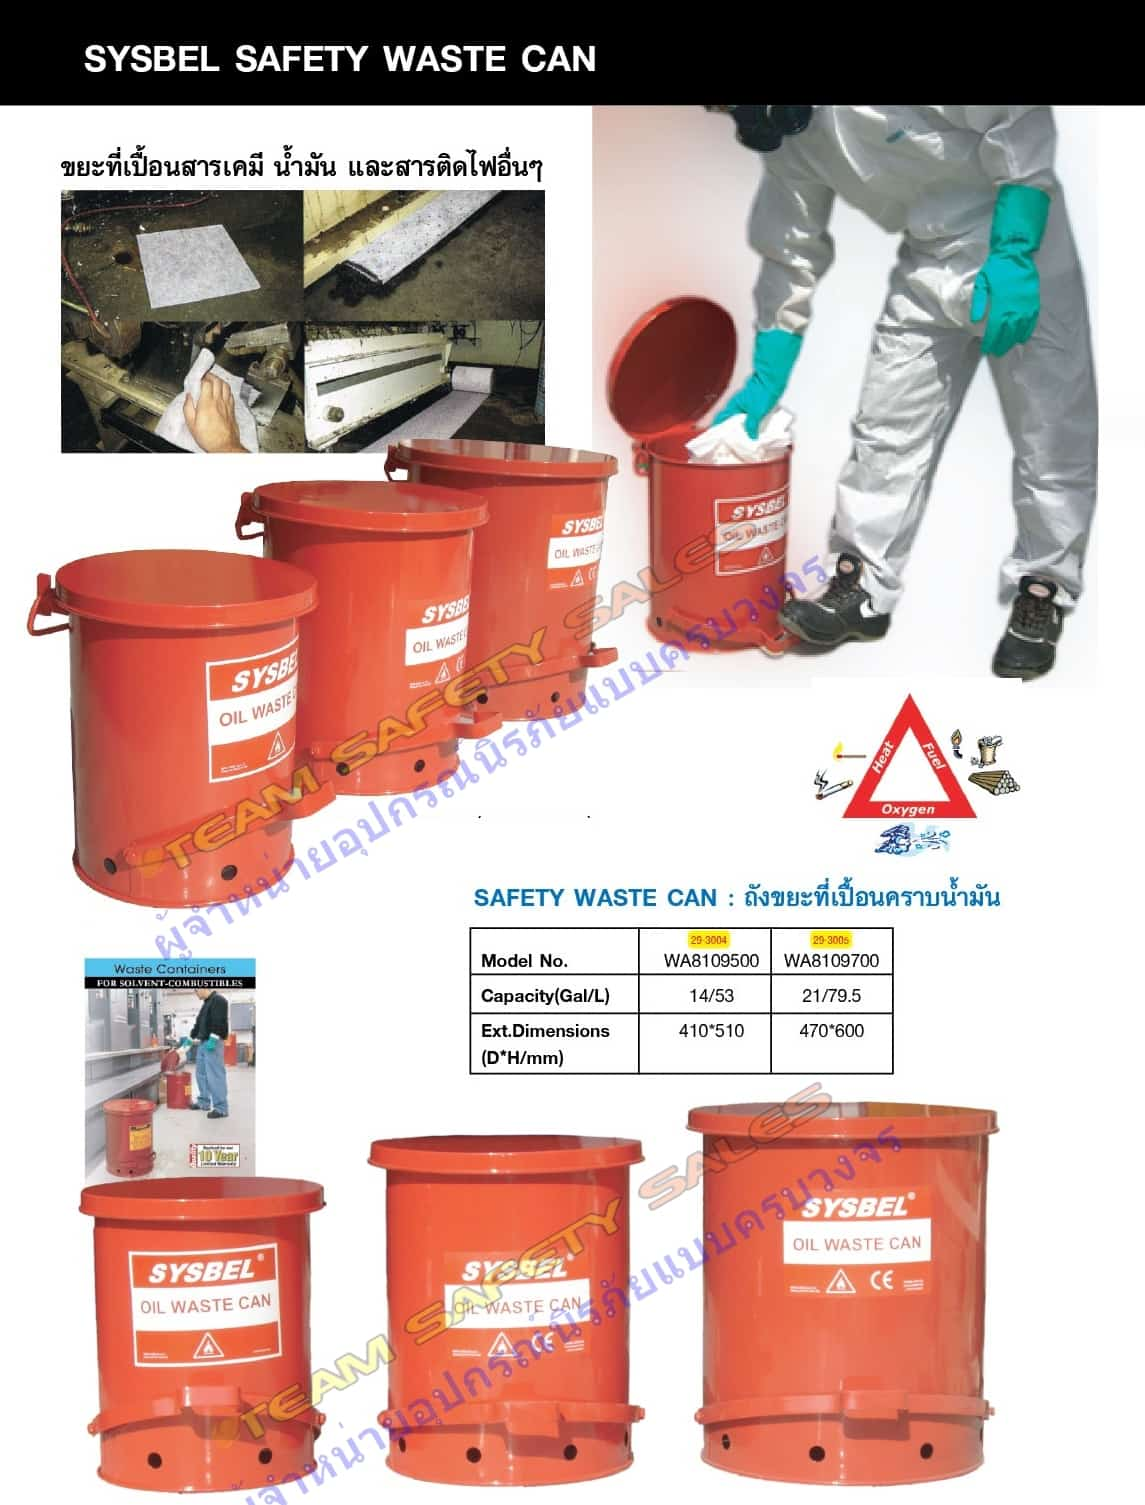 https://www.supersafetythailand.com/wp-content/uploads/2017/05/Sec29-p1-2-safety-waste-can.jpg